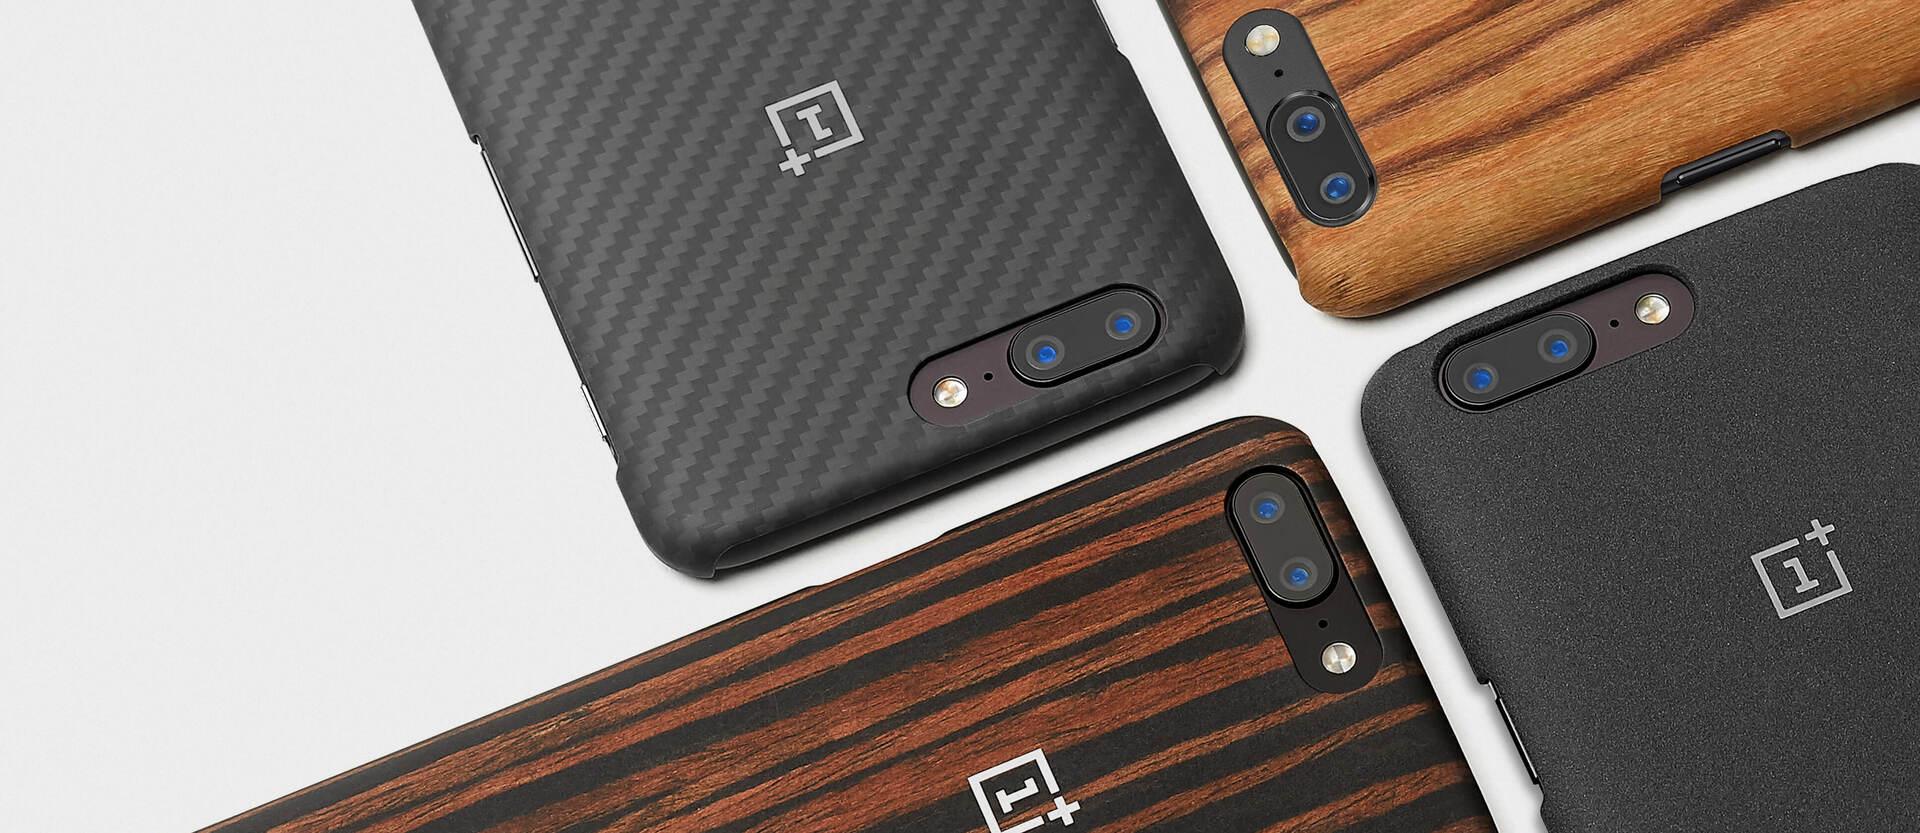 OnePlus 5 Protective Case